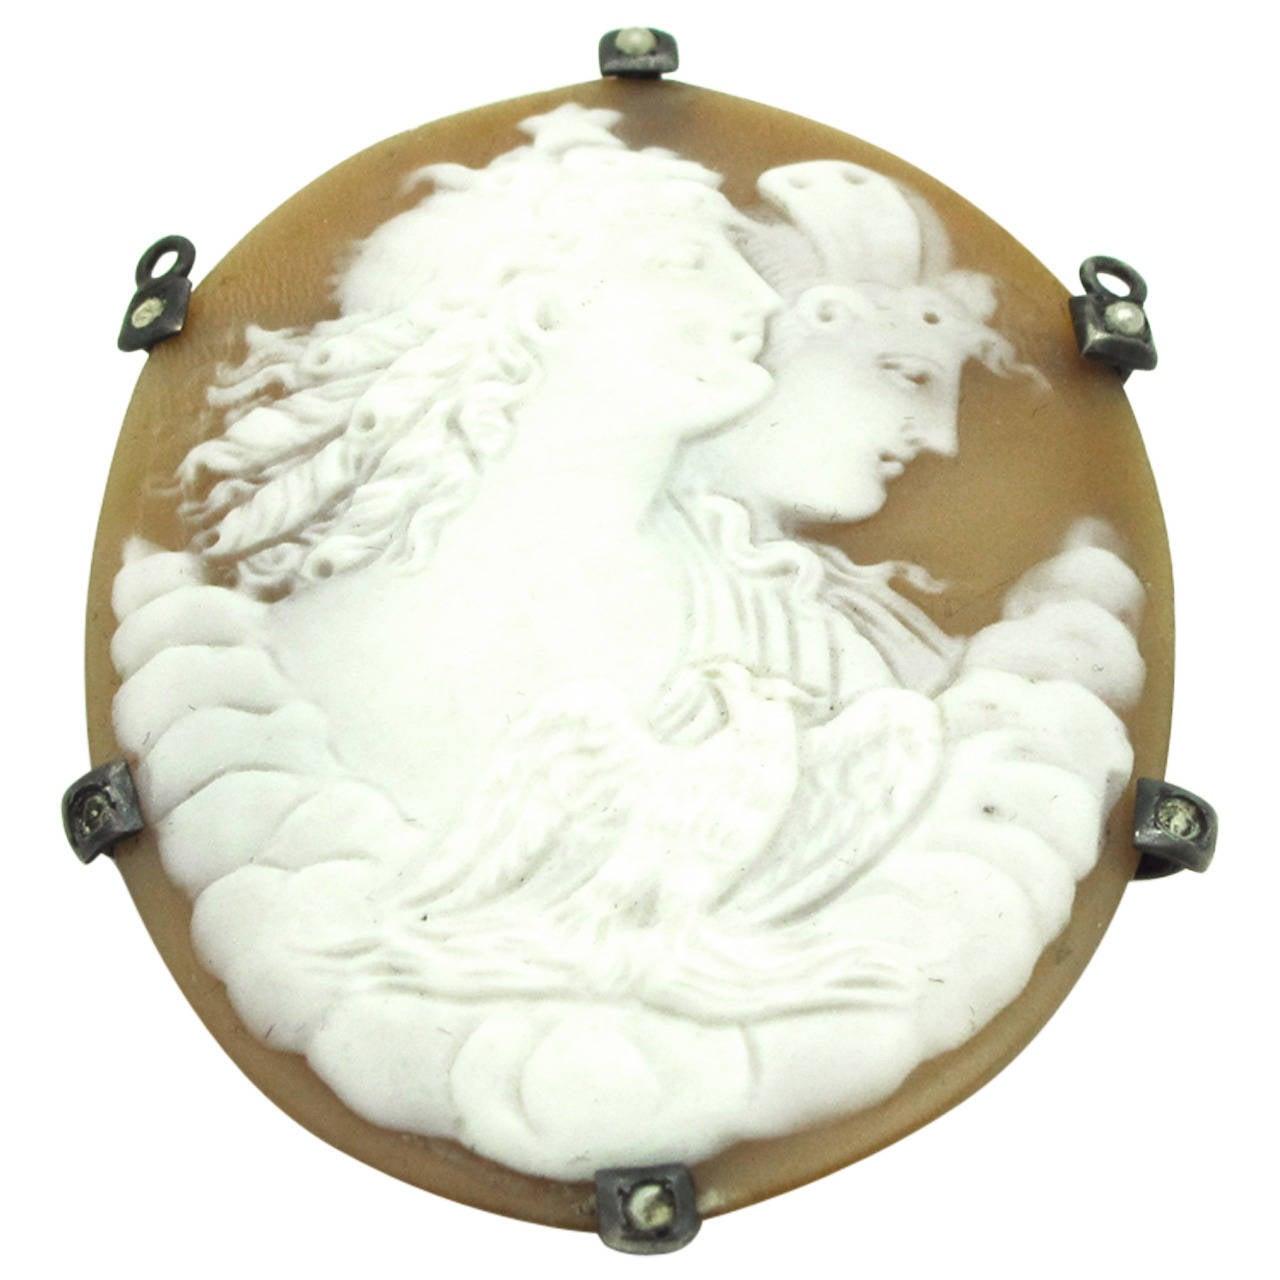 Victorian Mythological Cameo Silver Pin Pendant